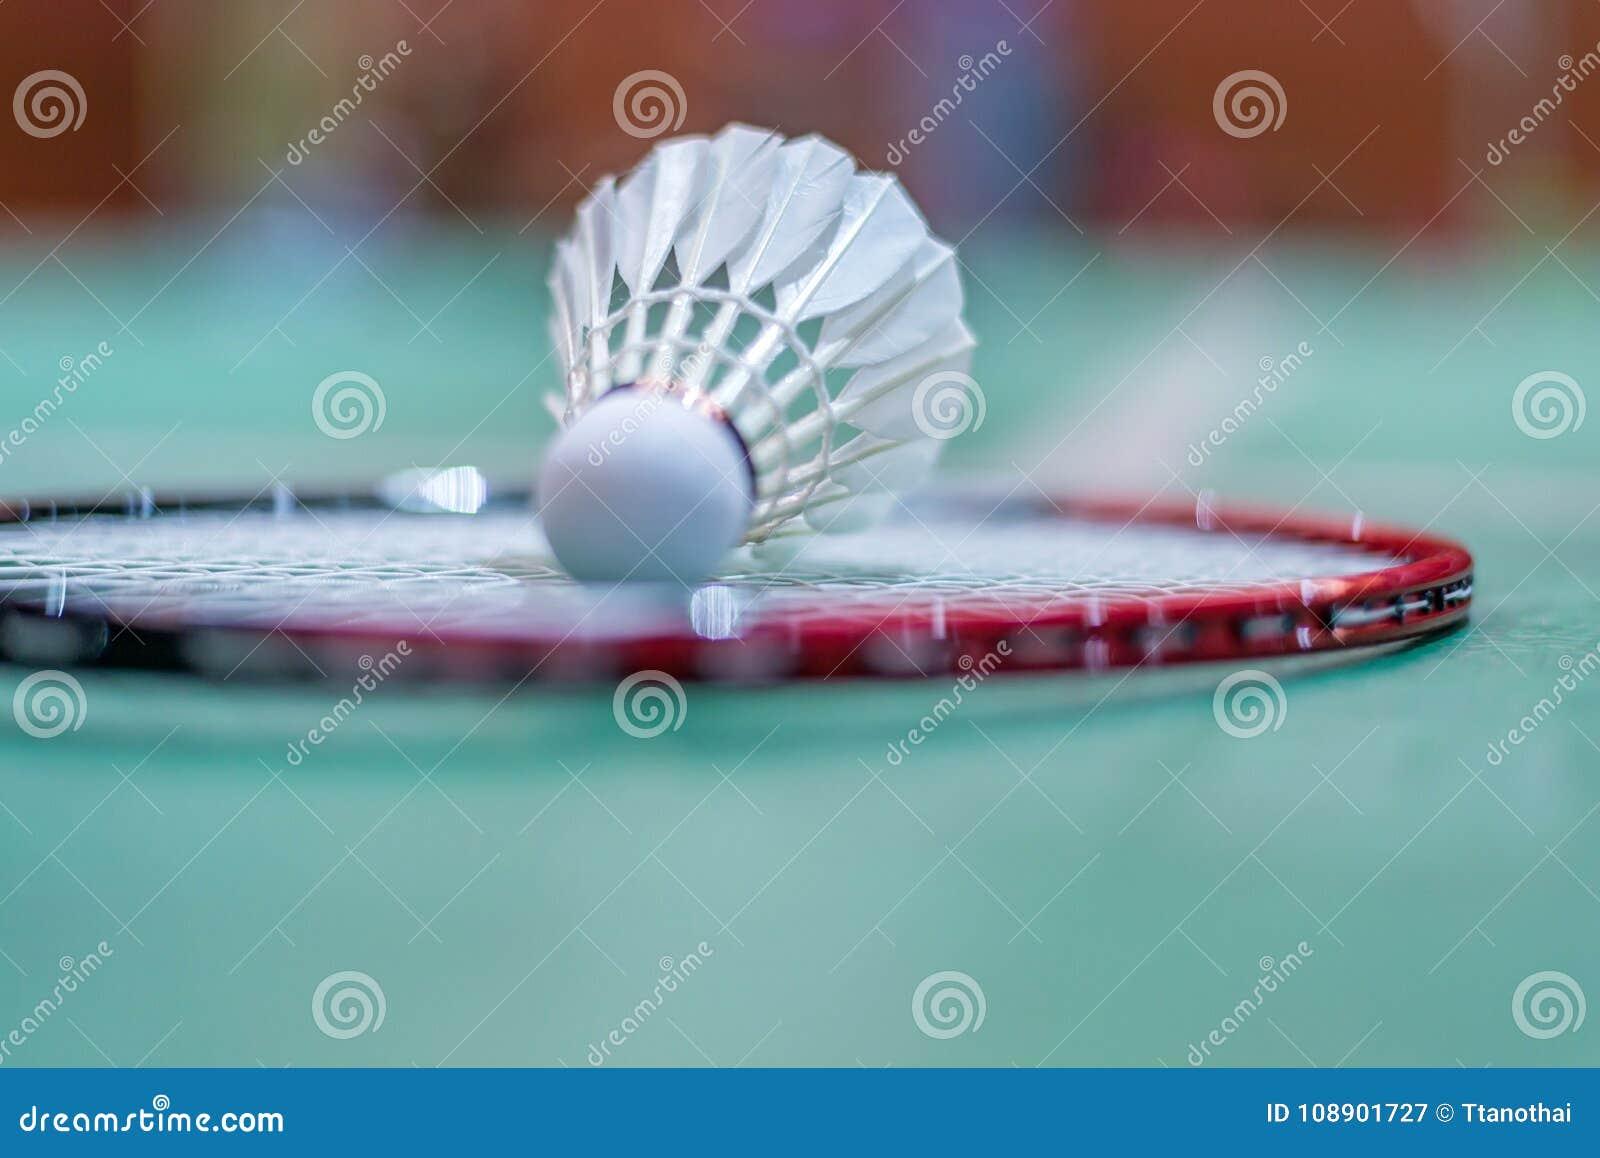 Badmintonshuttle op badmintonracket op vloer